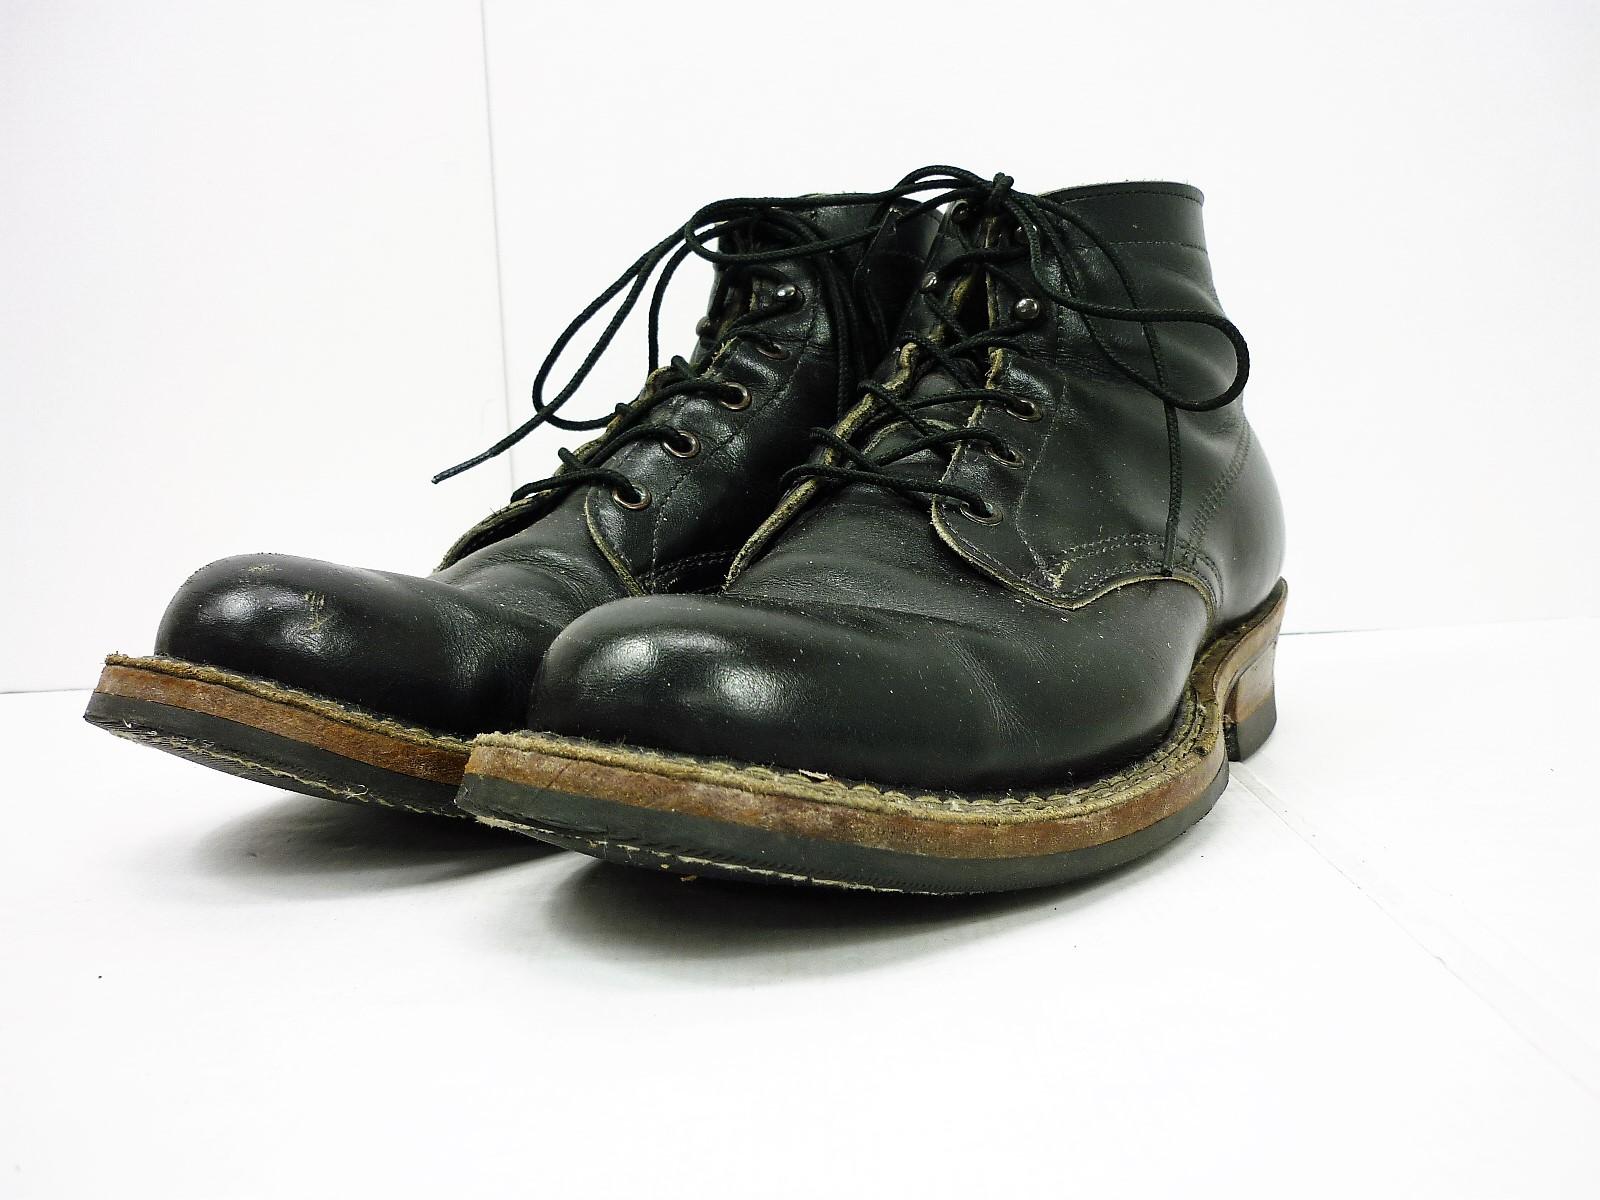 WHITE'S BOOTS 714 セミドレス レースアップワークブーツ ブラック size:9 1/2 E ホワイツブーツ